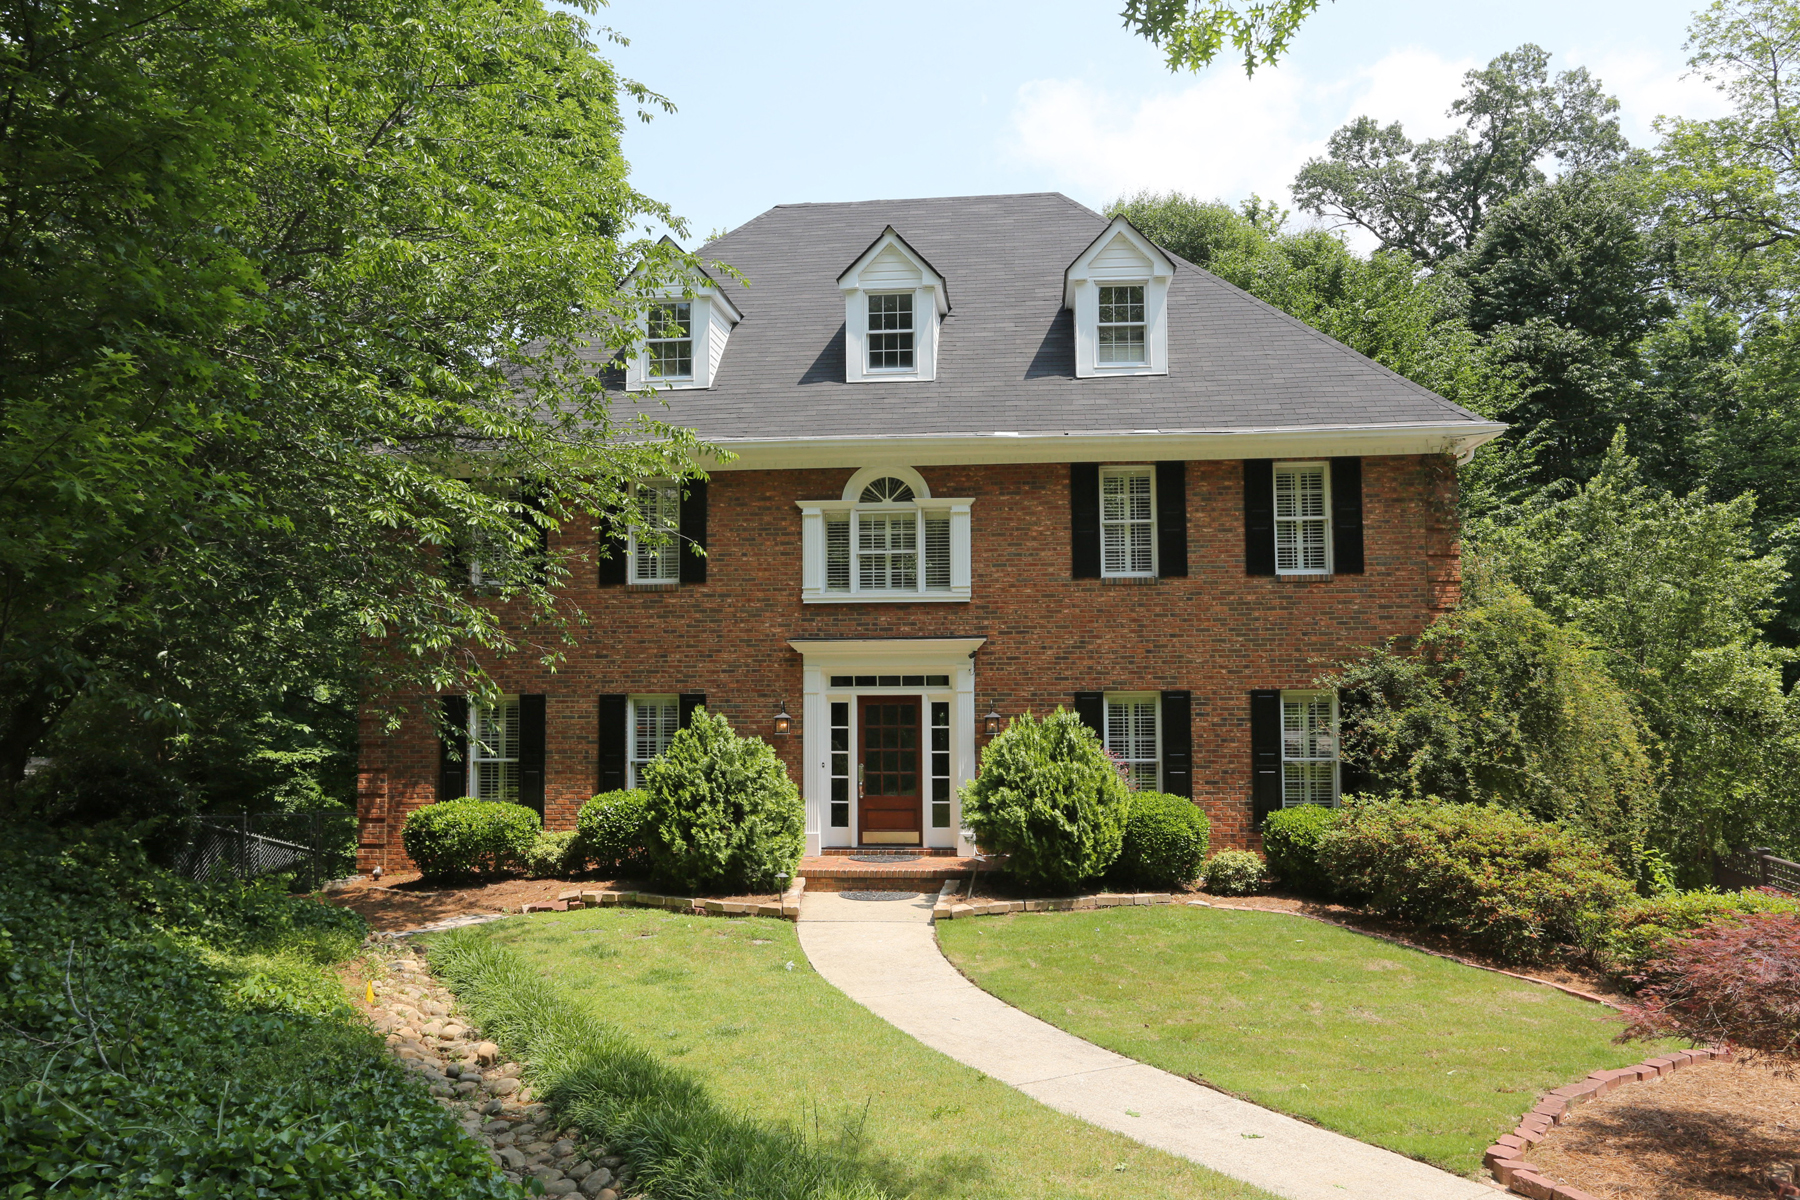 Moradia para Venda às Beautiful Updated Home in Popular Pine Hills! 1983 Woodsdale Rd Pine Hills, Atlanta, Geórgia, 30324 Estados Unidos